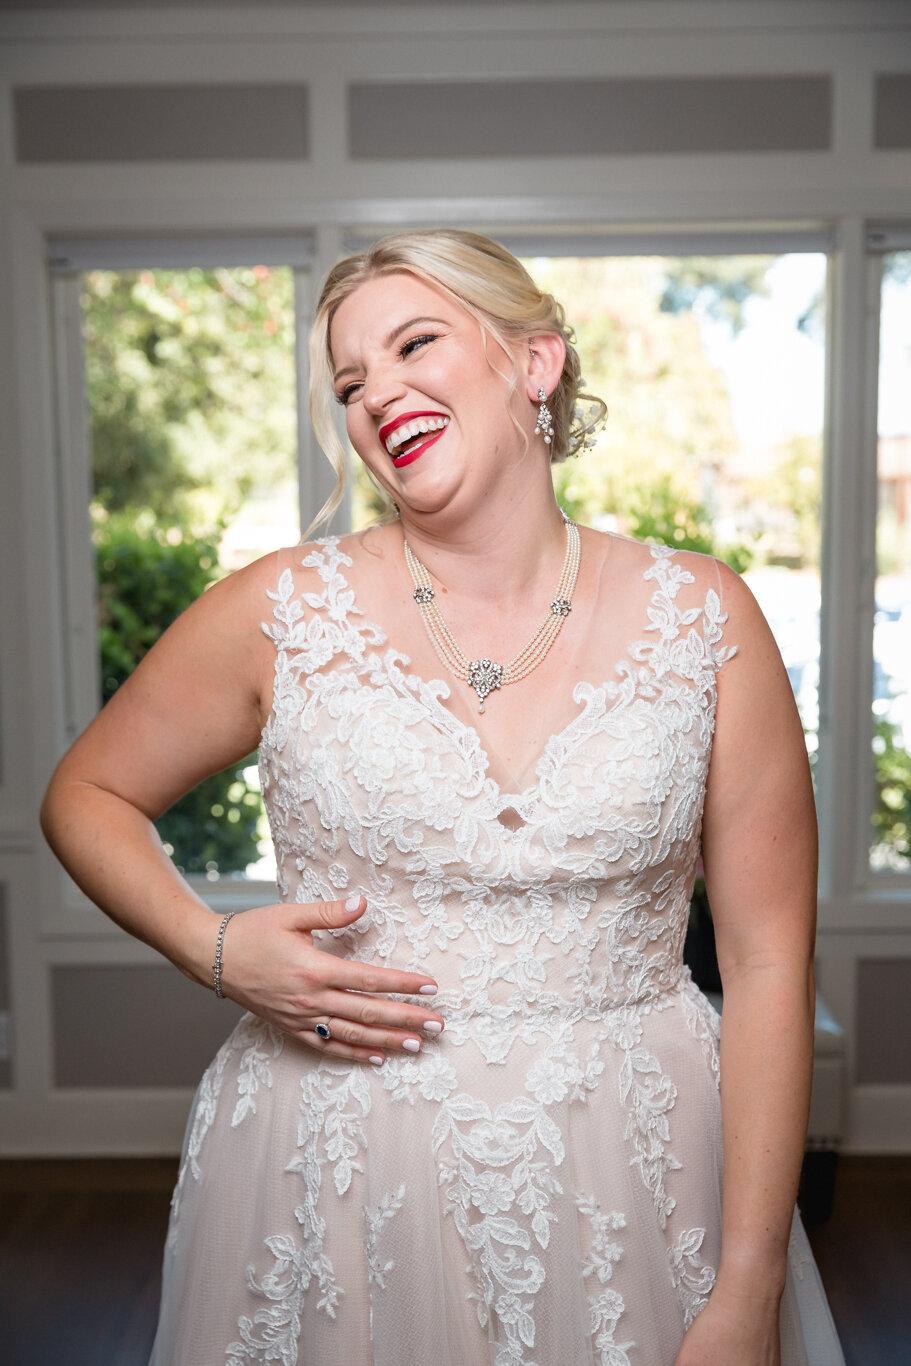 2019.08.24_Emily-Ashir-Wedding-at-the-Maples-5220.jpg